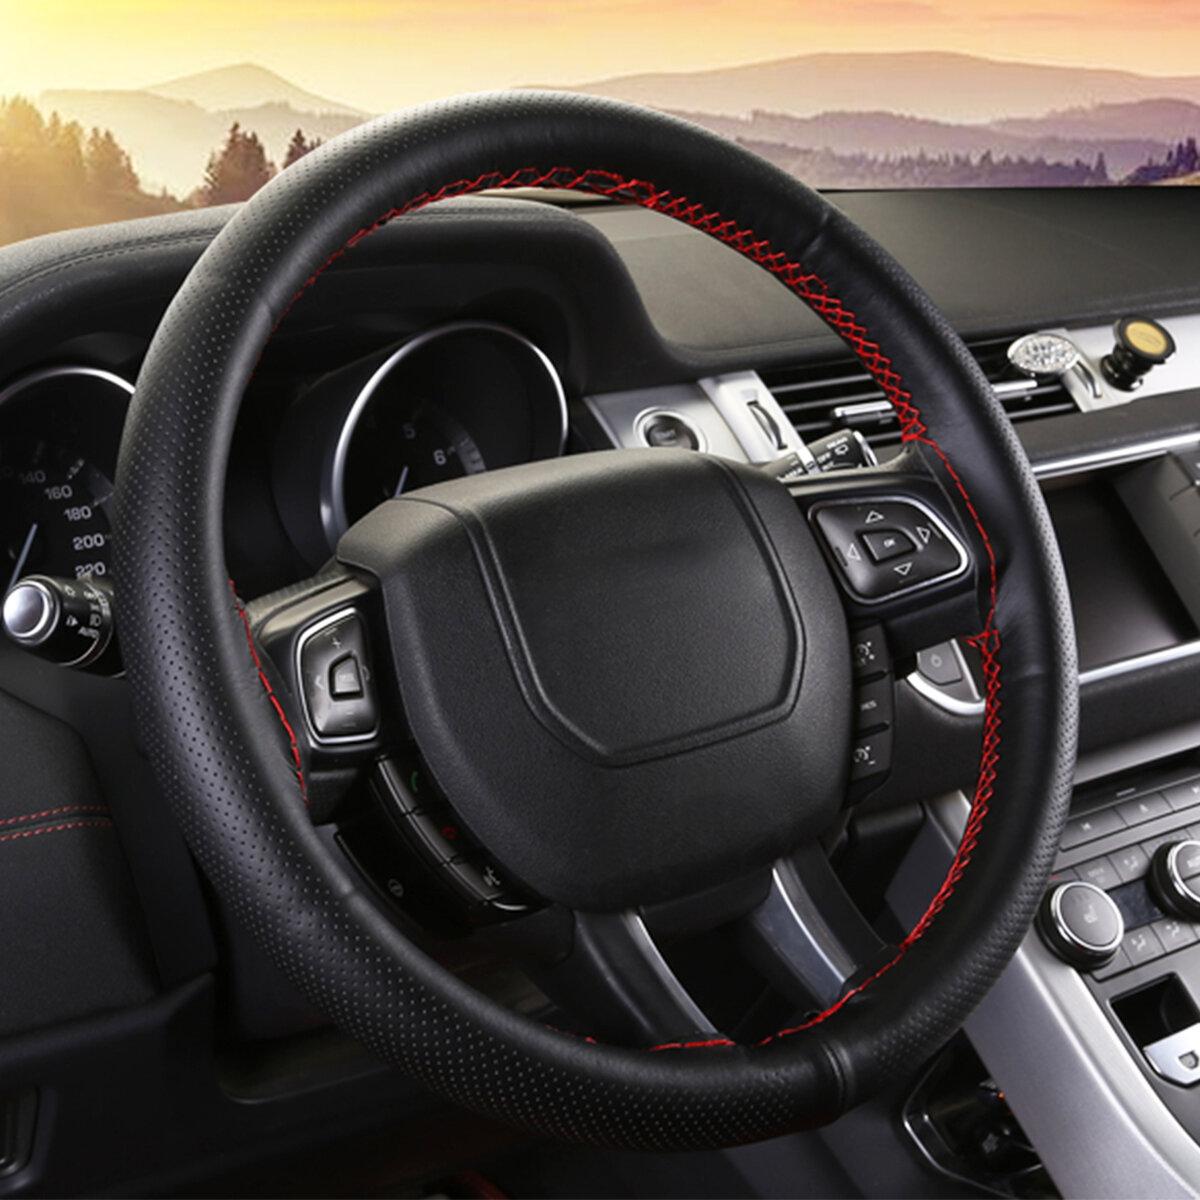 Black Red Line Car With Hand Sewing Steering Wheel Set Car Steering Wheel Covers